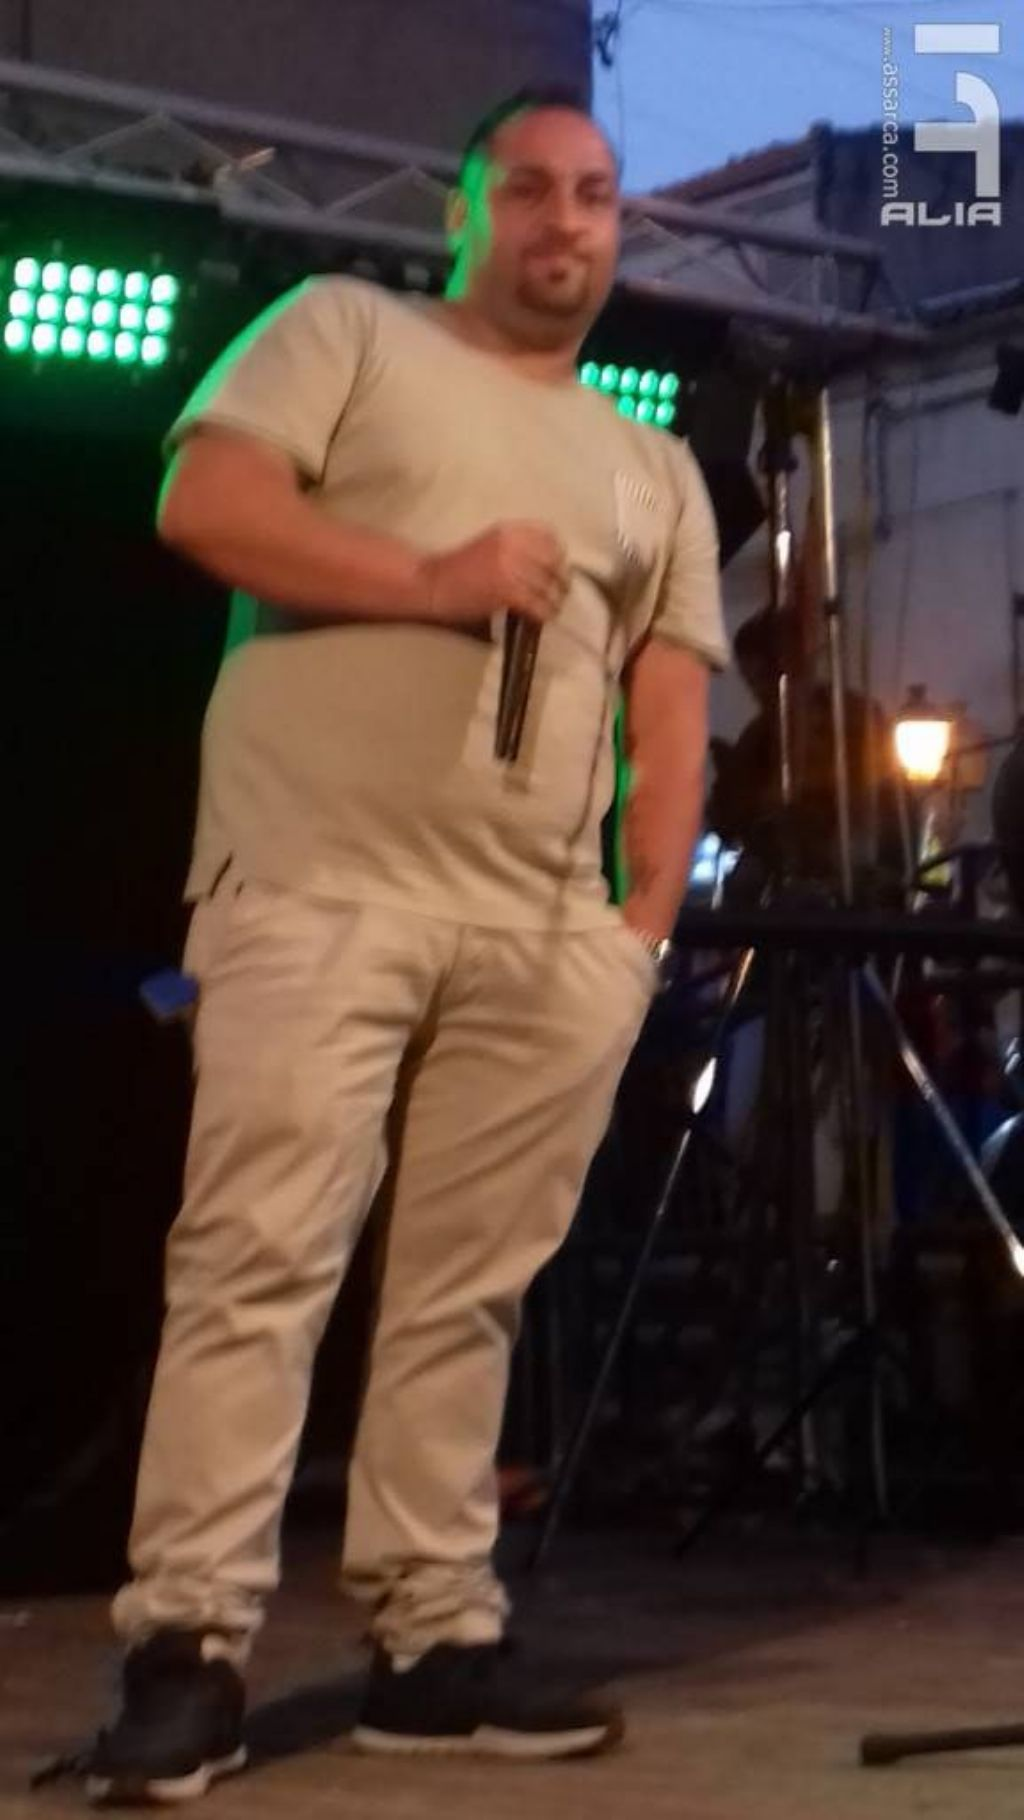 Anteprima Alia Song 2018